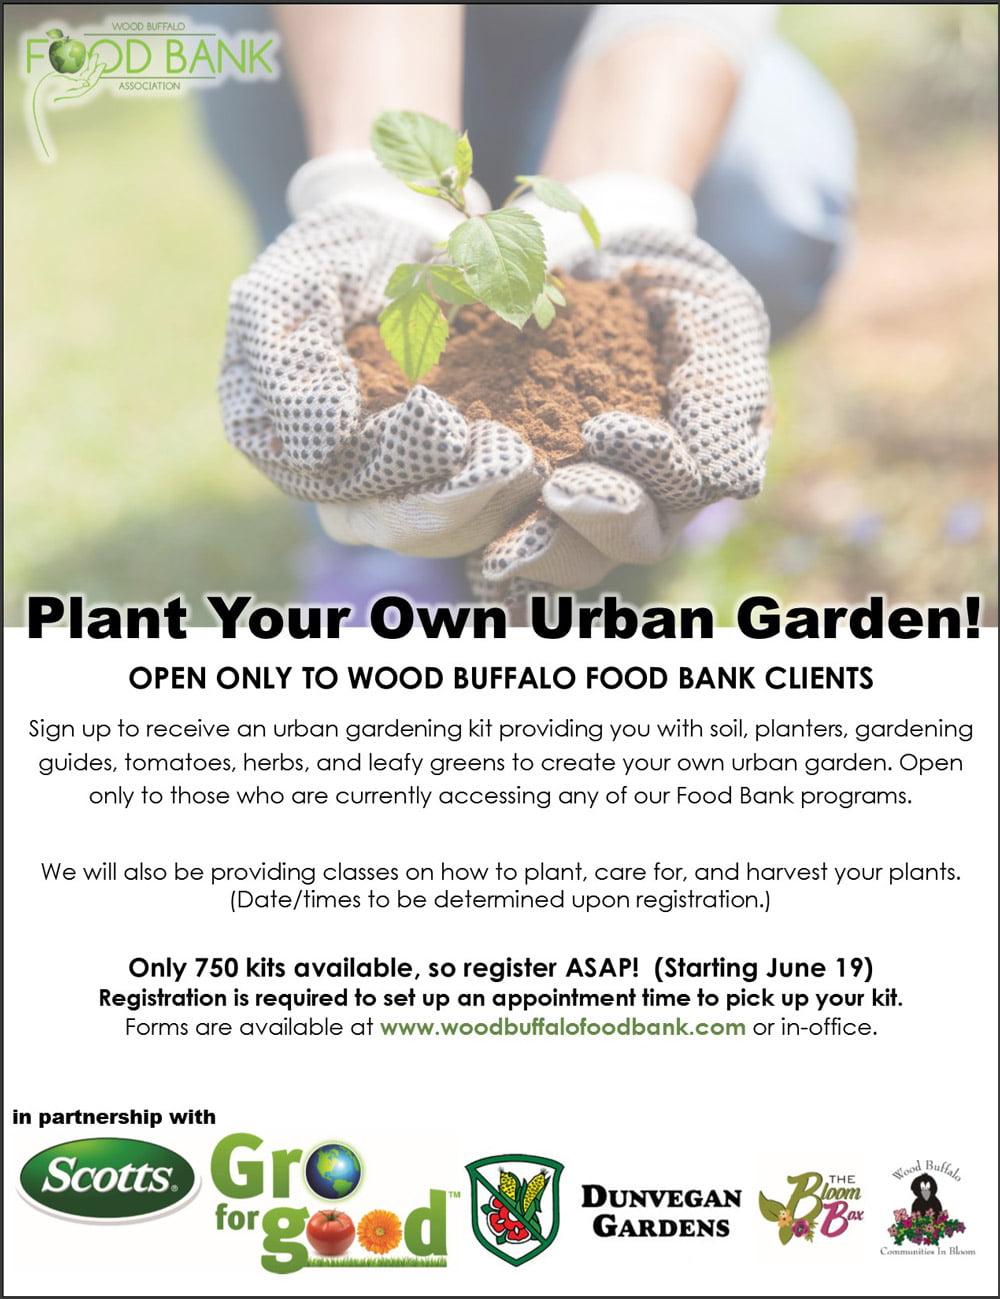 Grow for Good Program - Urban Gardening